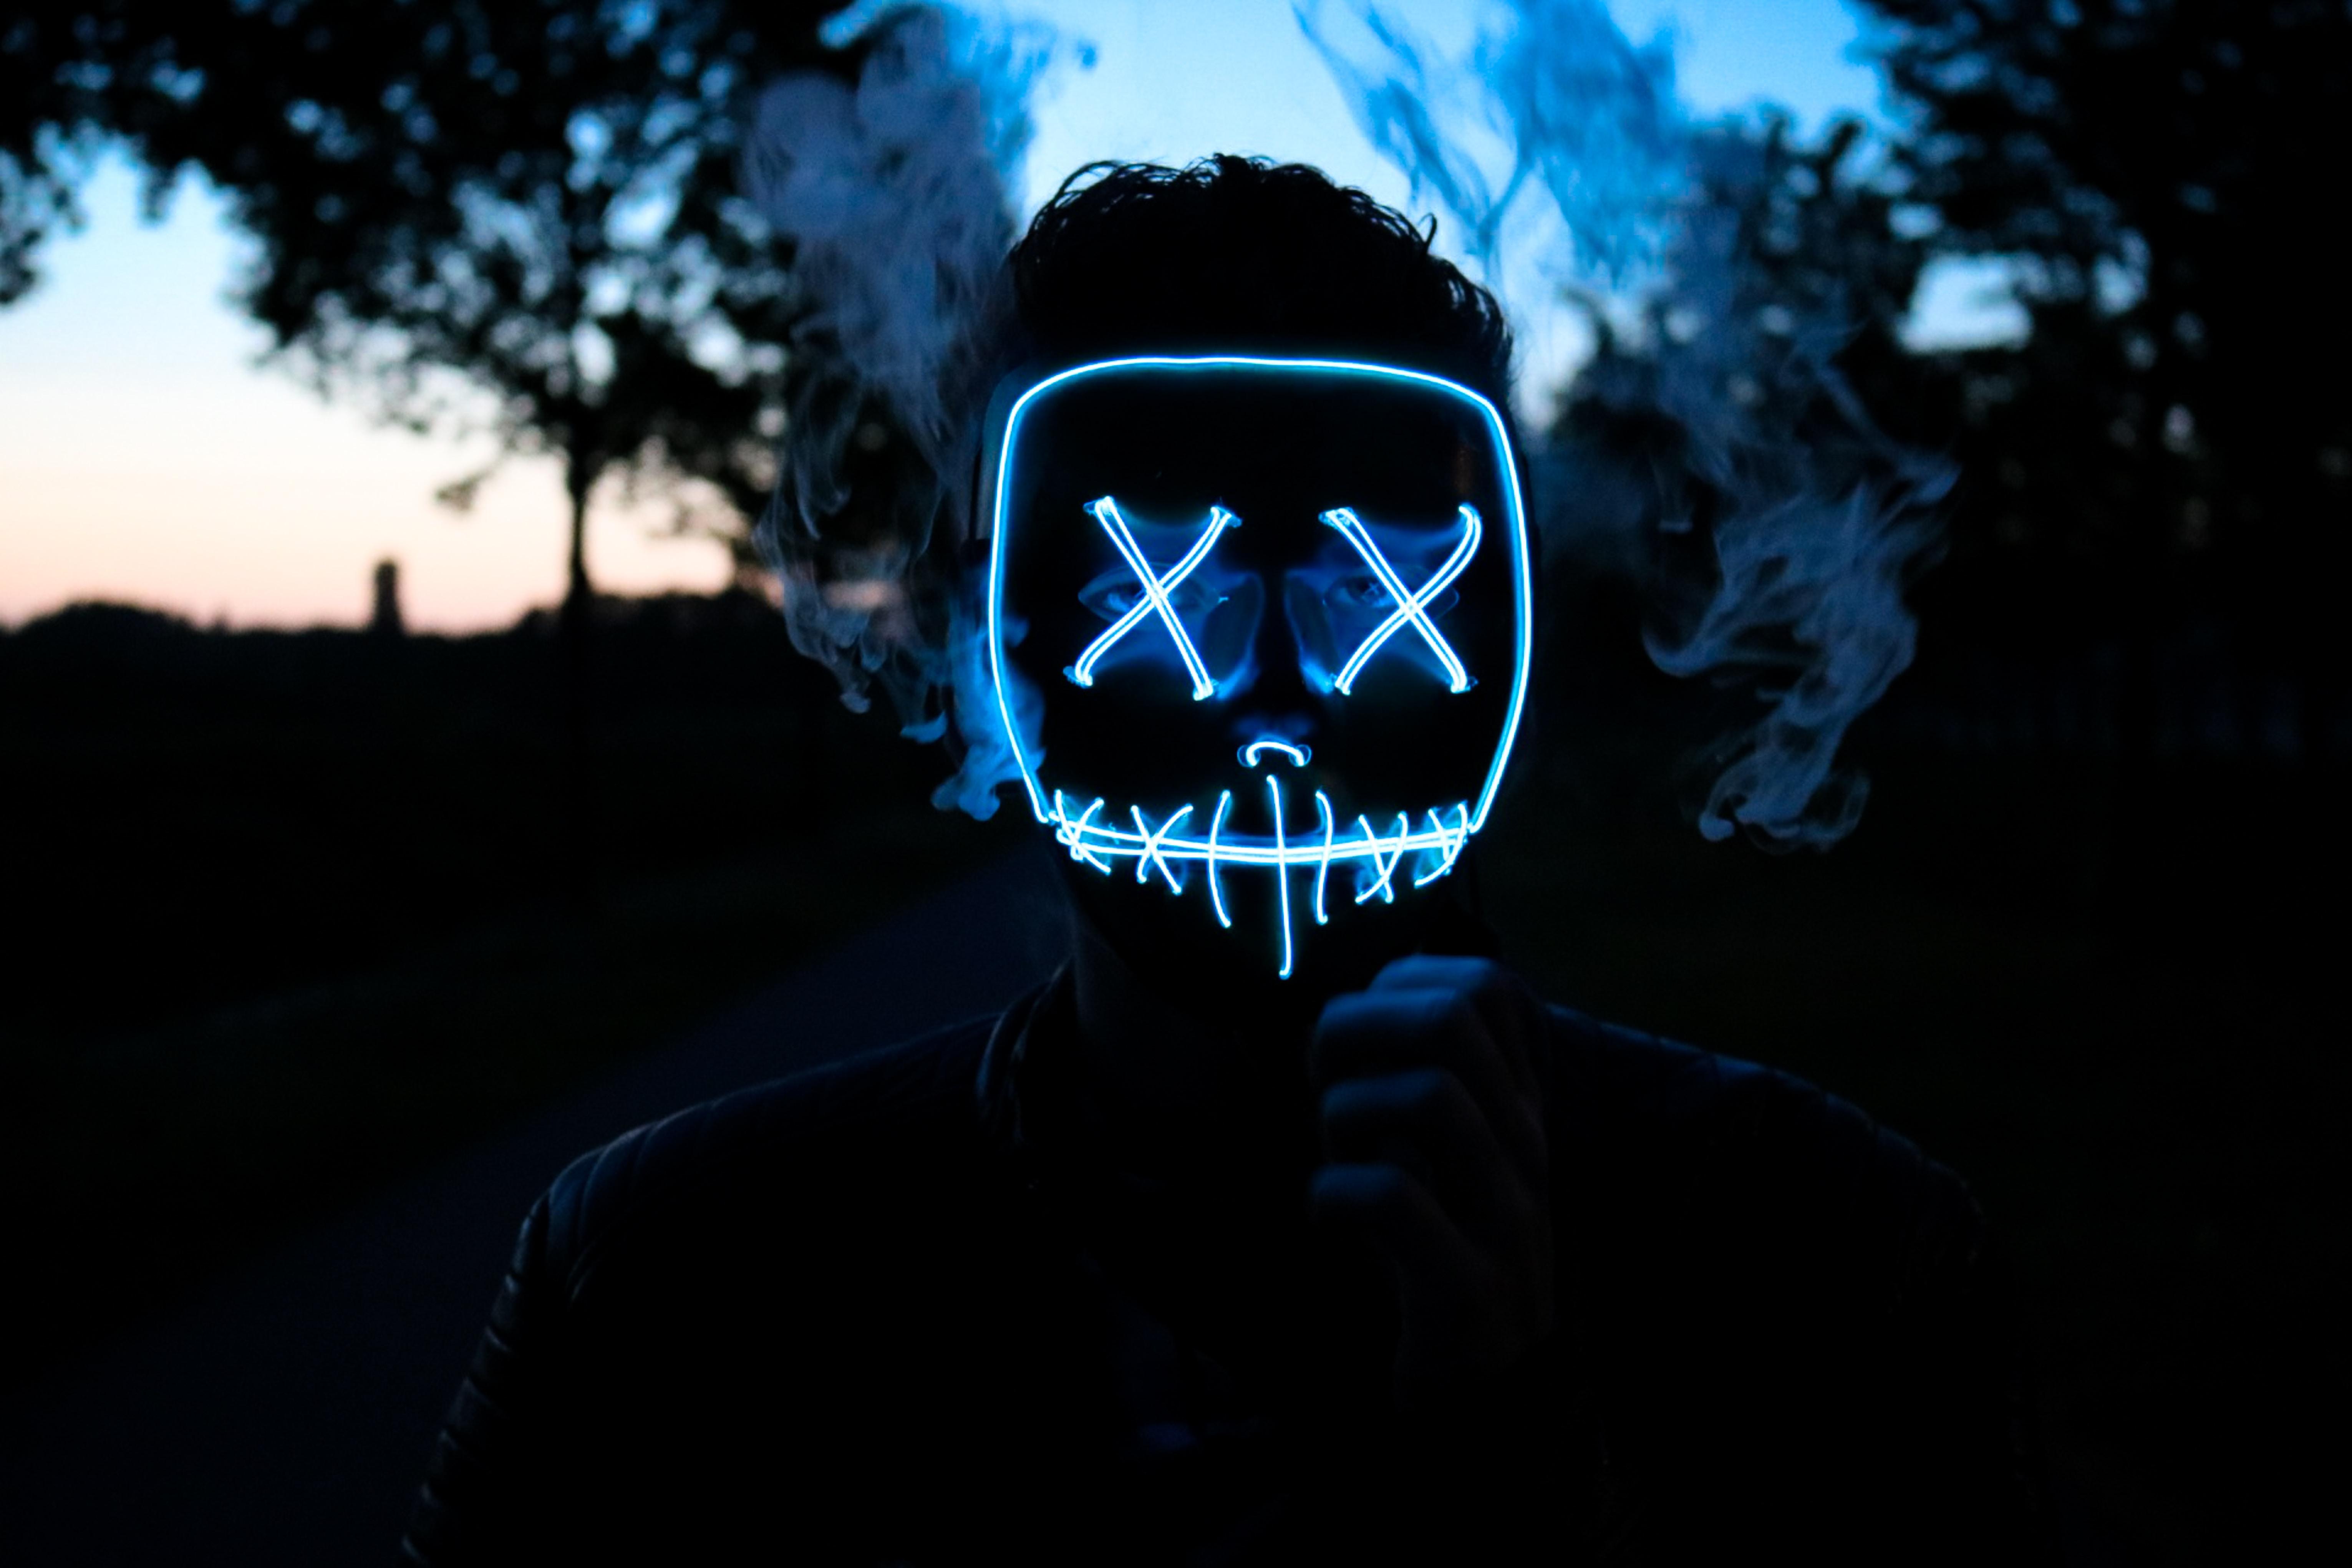 man wearing LED mask